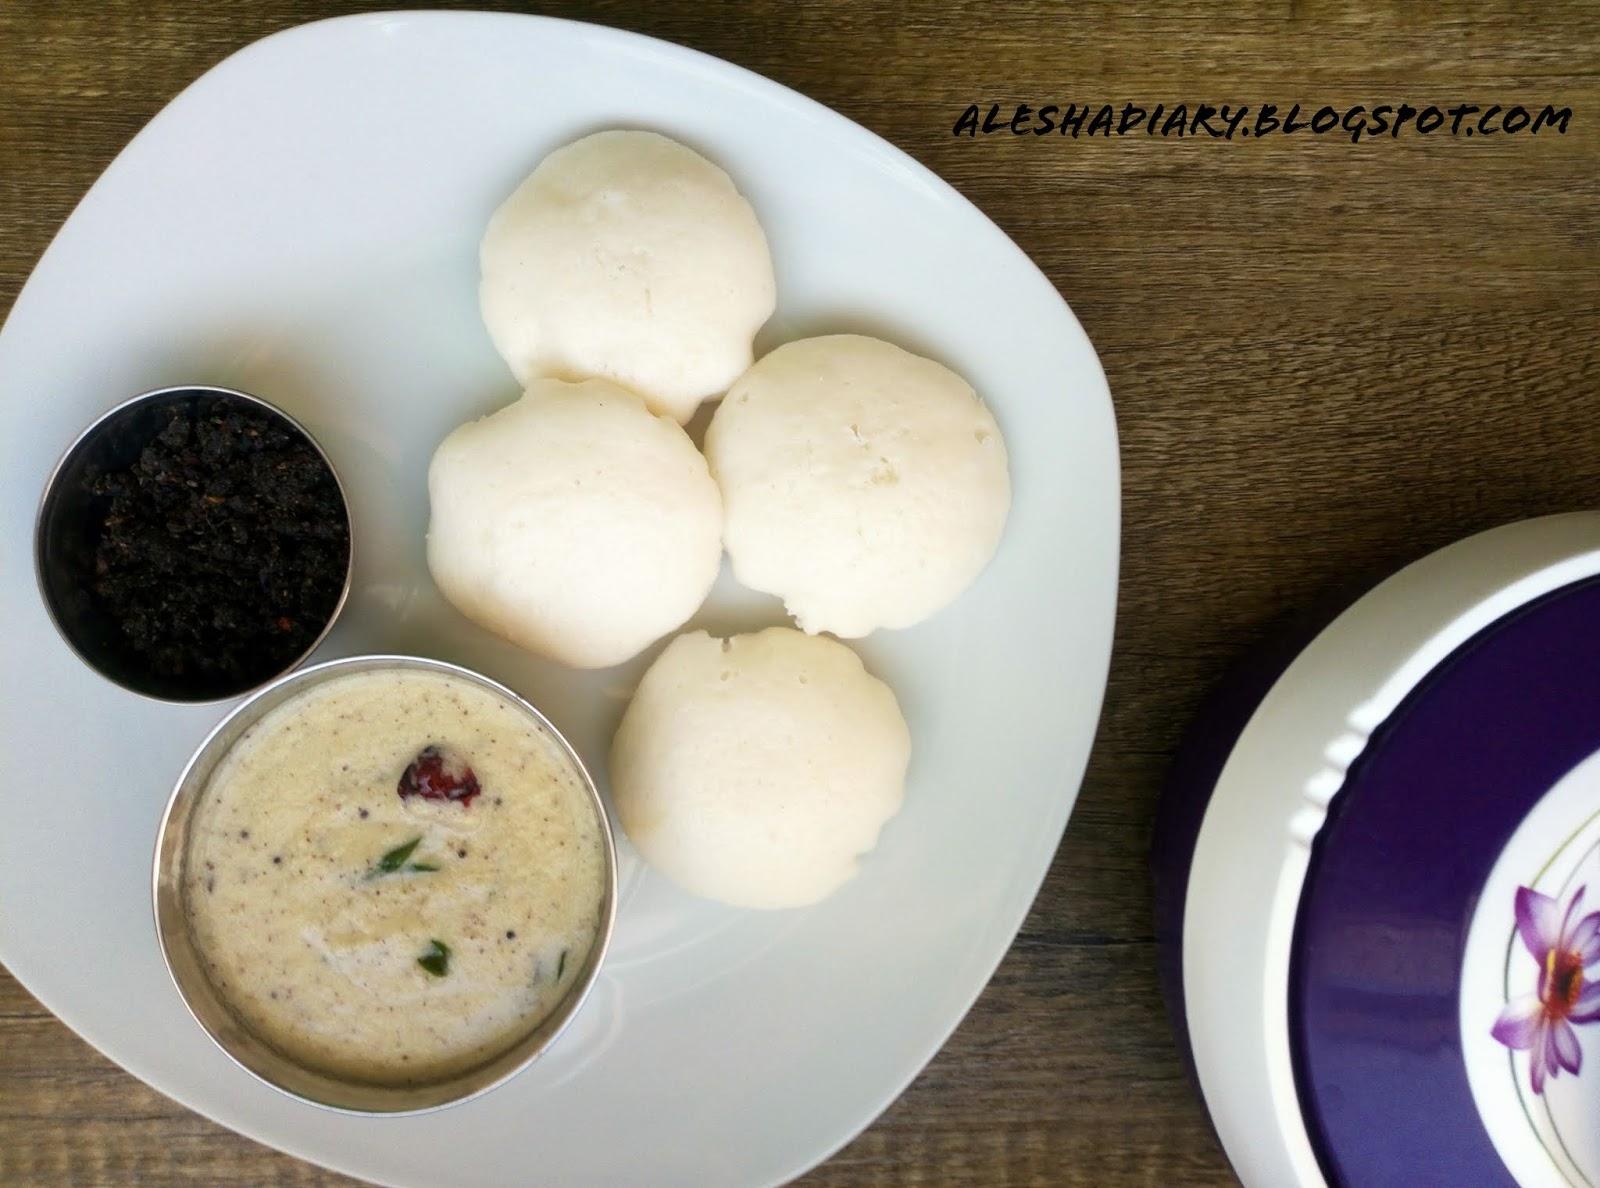 How to make Idli/Dosa Batter-Soft Idli-Crispy Dosa-இட்லி தோசை மாவு – 2 in 1 batter